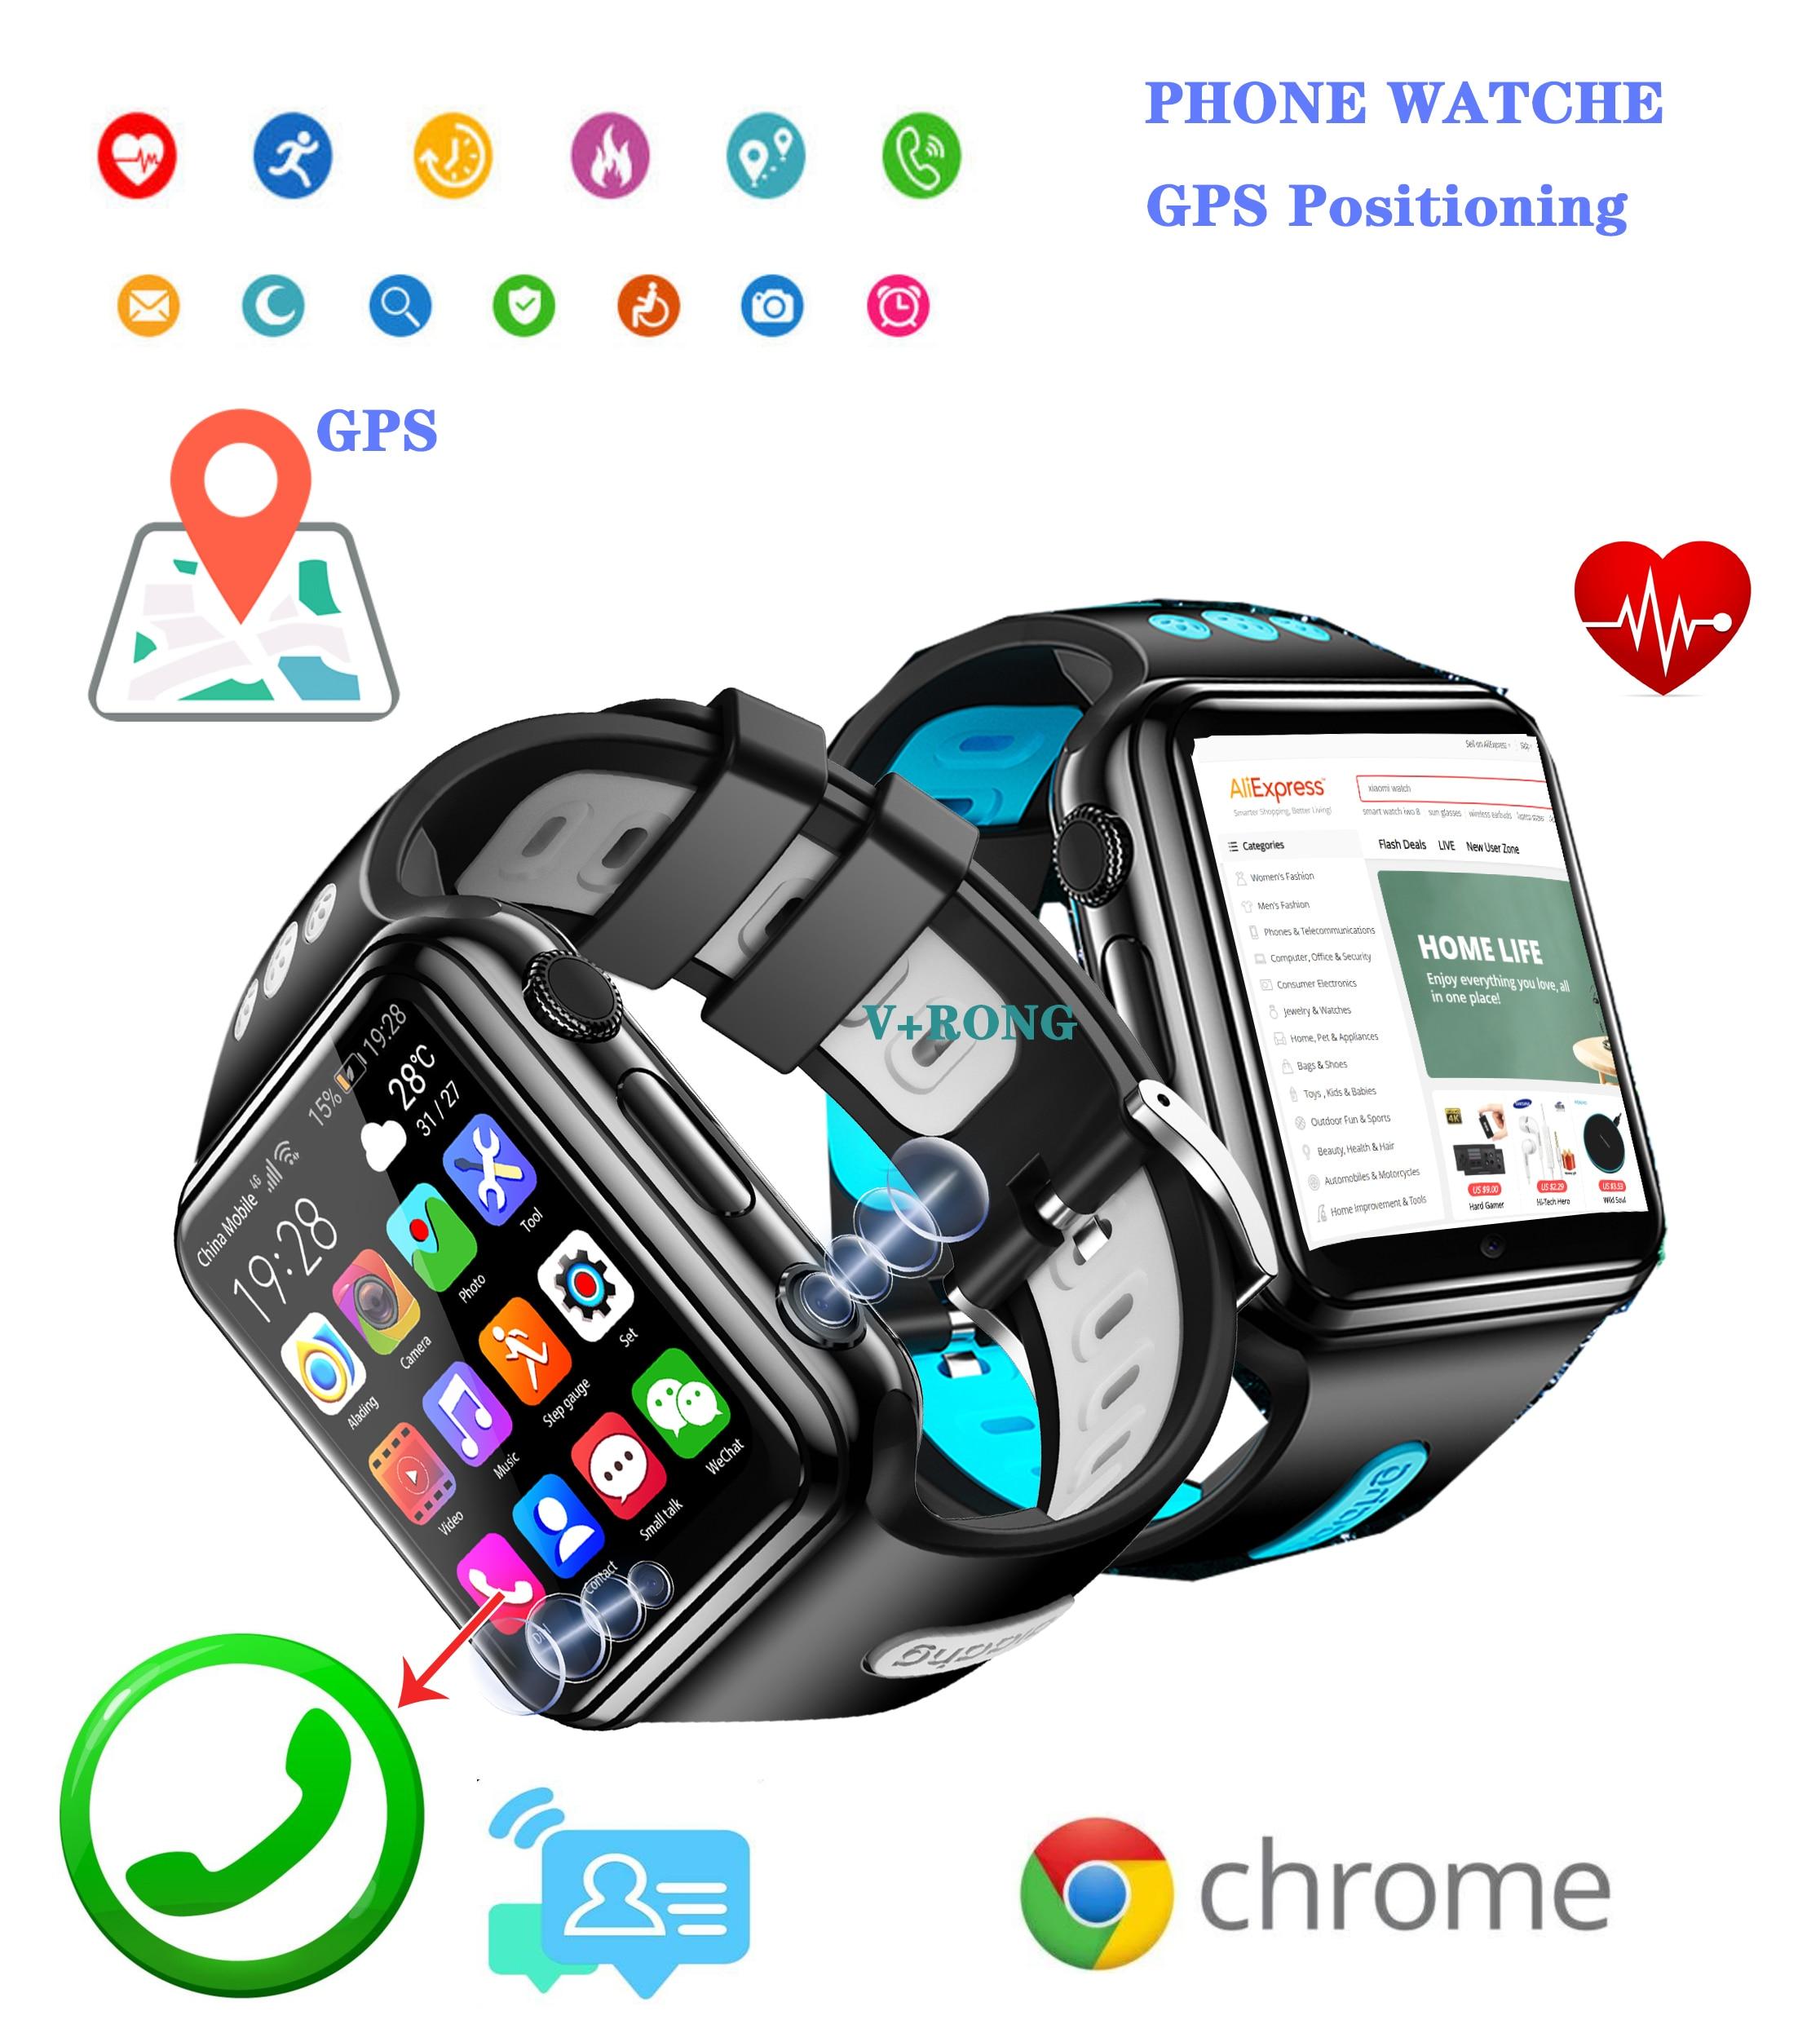 Smart Watch Nfc Kids Men And Women W5 2020 New 5G Sim Card Phone Watch GPS Positioning Waterproof NFC Payment Function Iwo 15